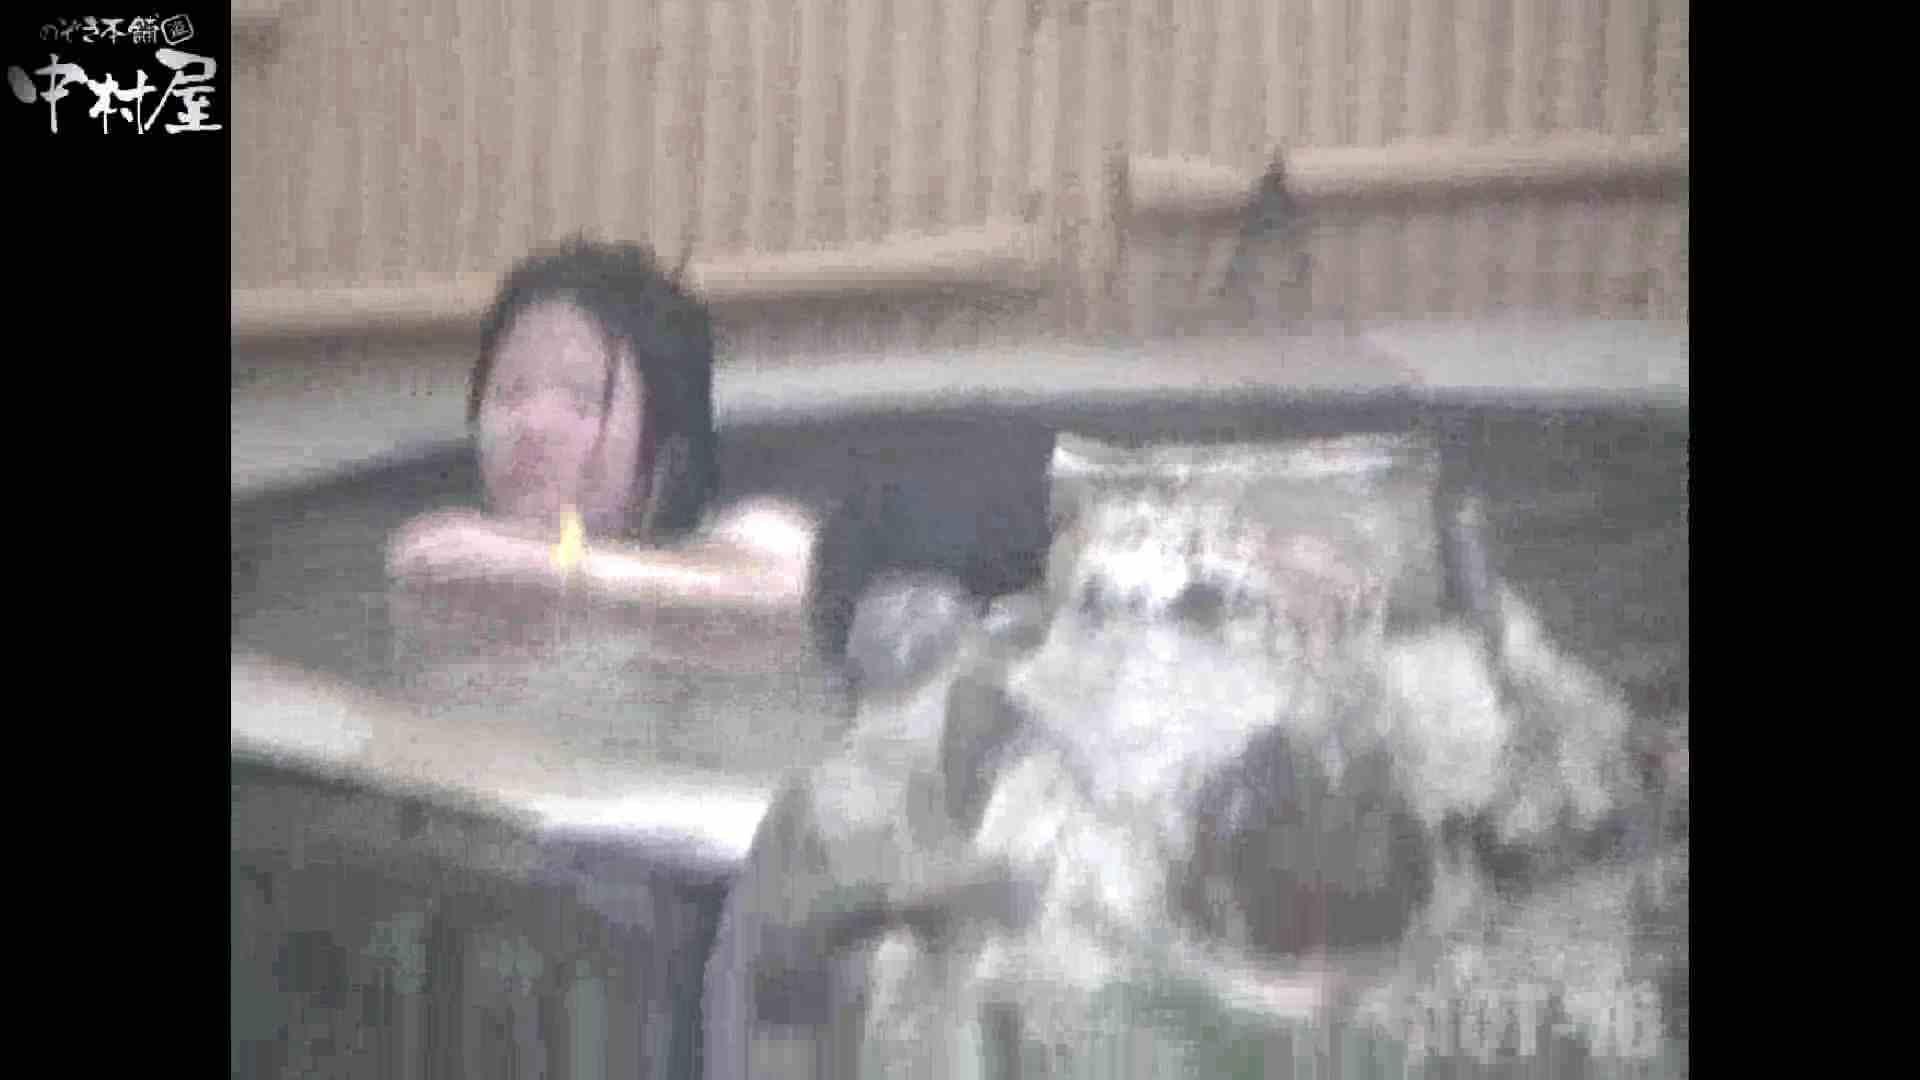 Aquaな露天風呂Vol.880潜入盗撮露天風呂十六判湯 其の八 潜入シリーズ | 盗撮  84pic 77